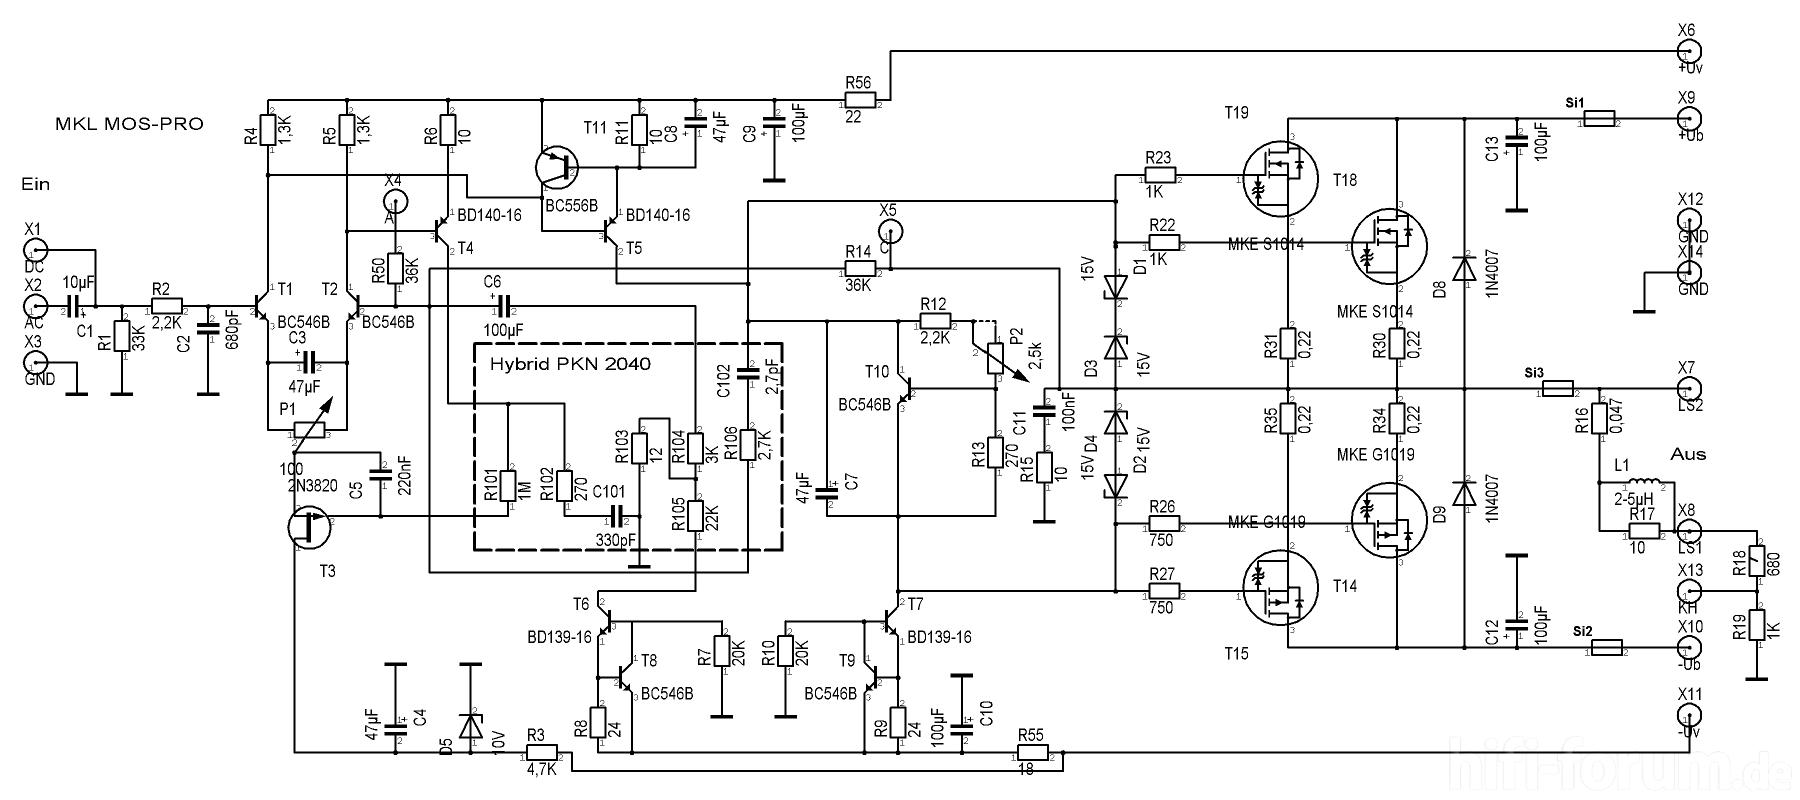 Schaltplan MKL MOS-PRO | doityourself, elektronik, endstufe, mkl ...